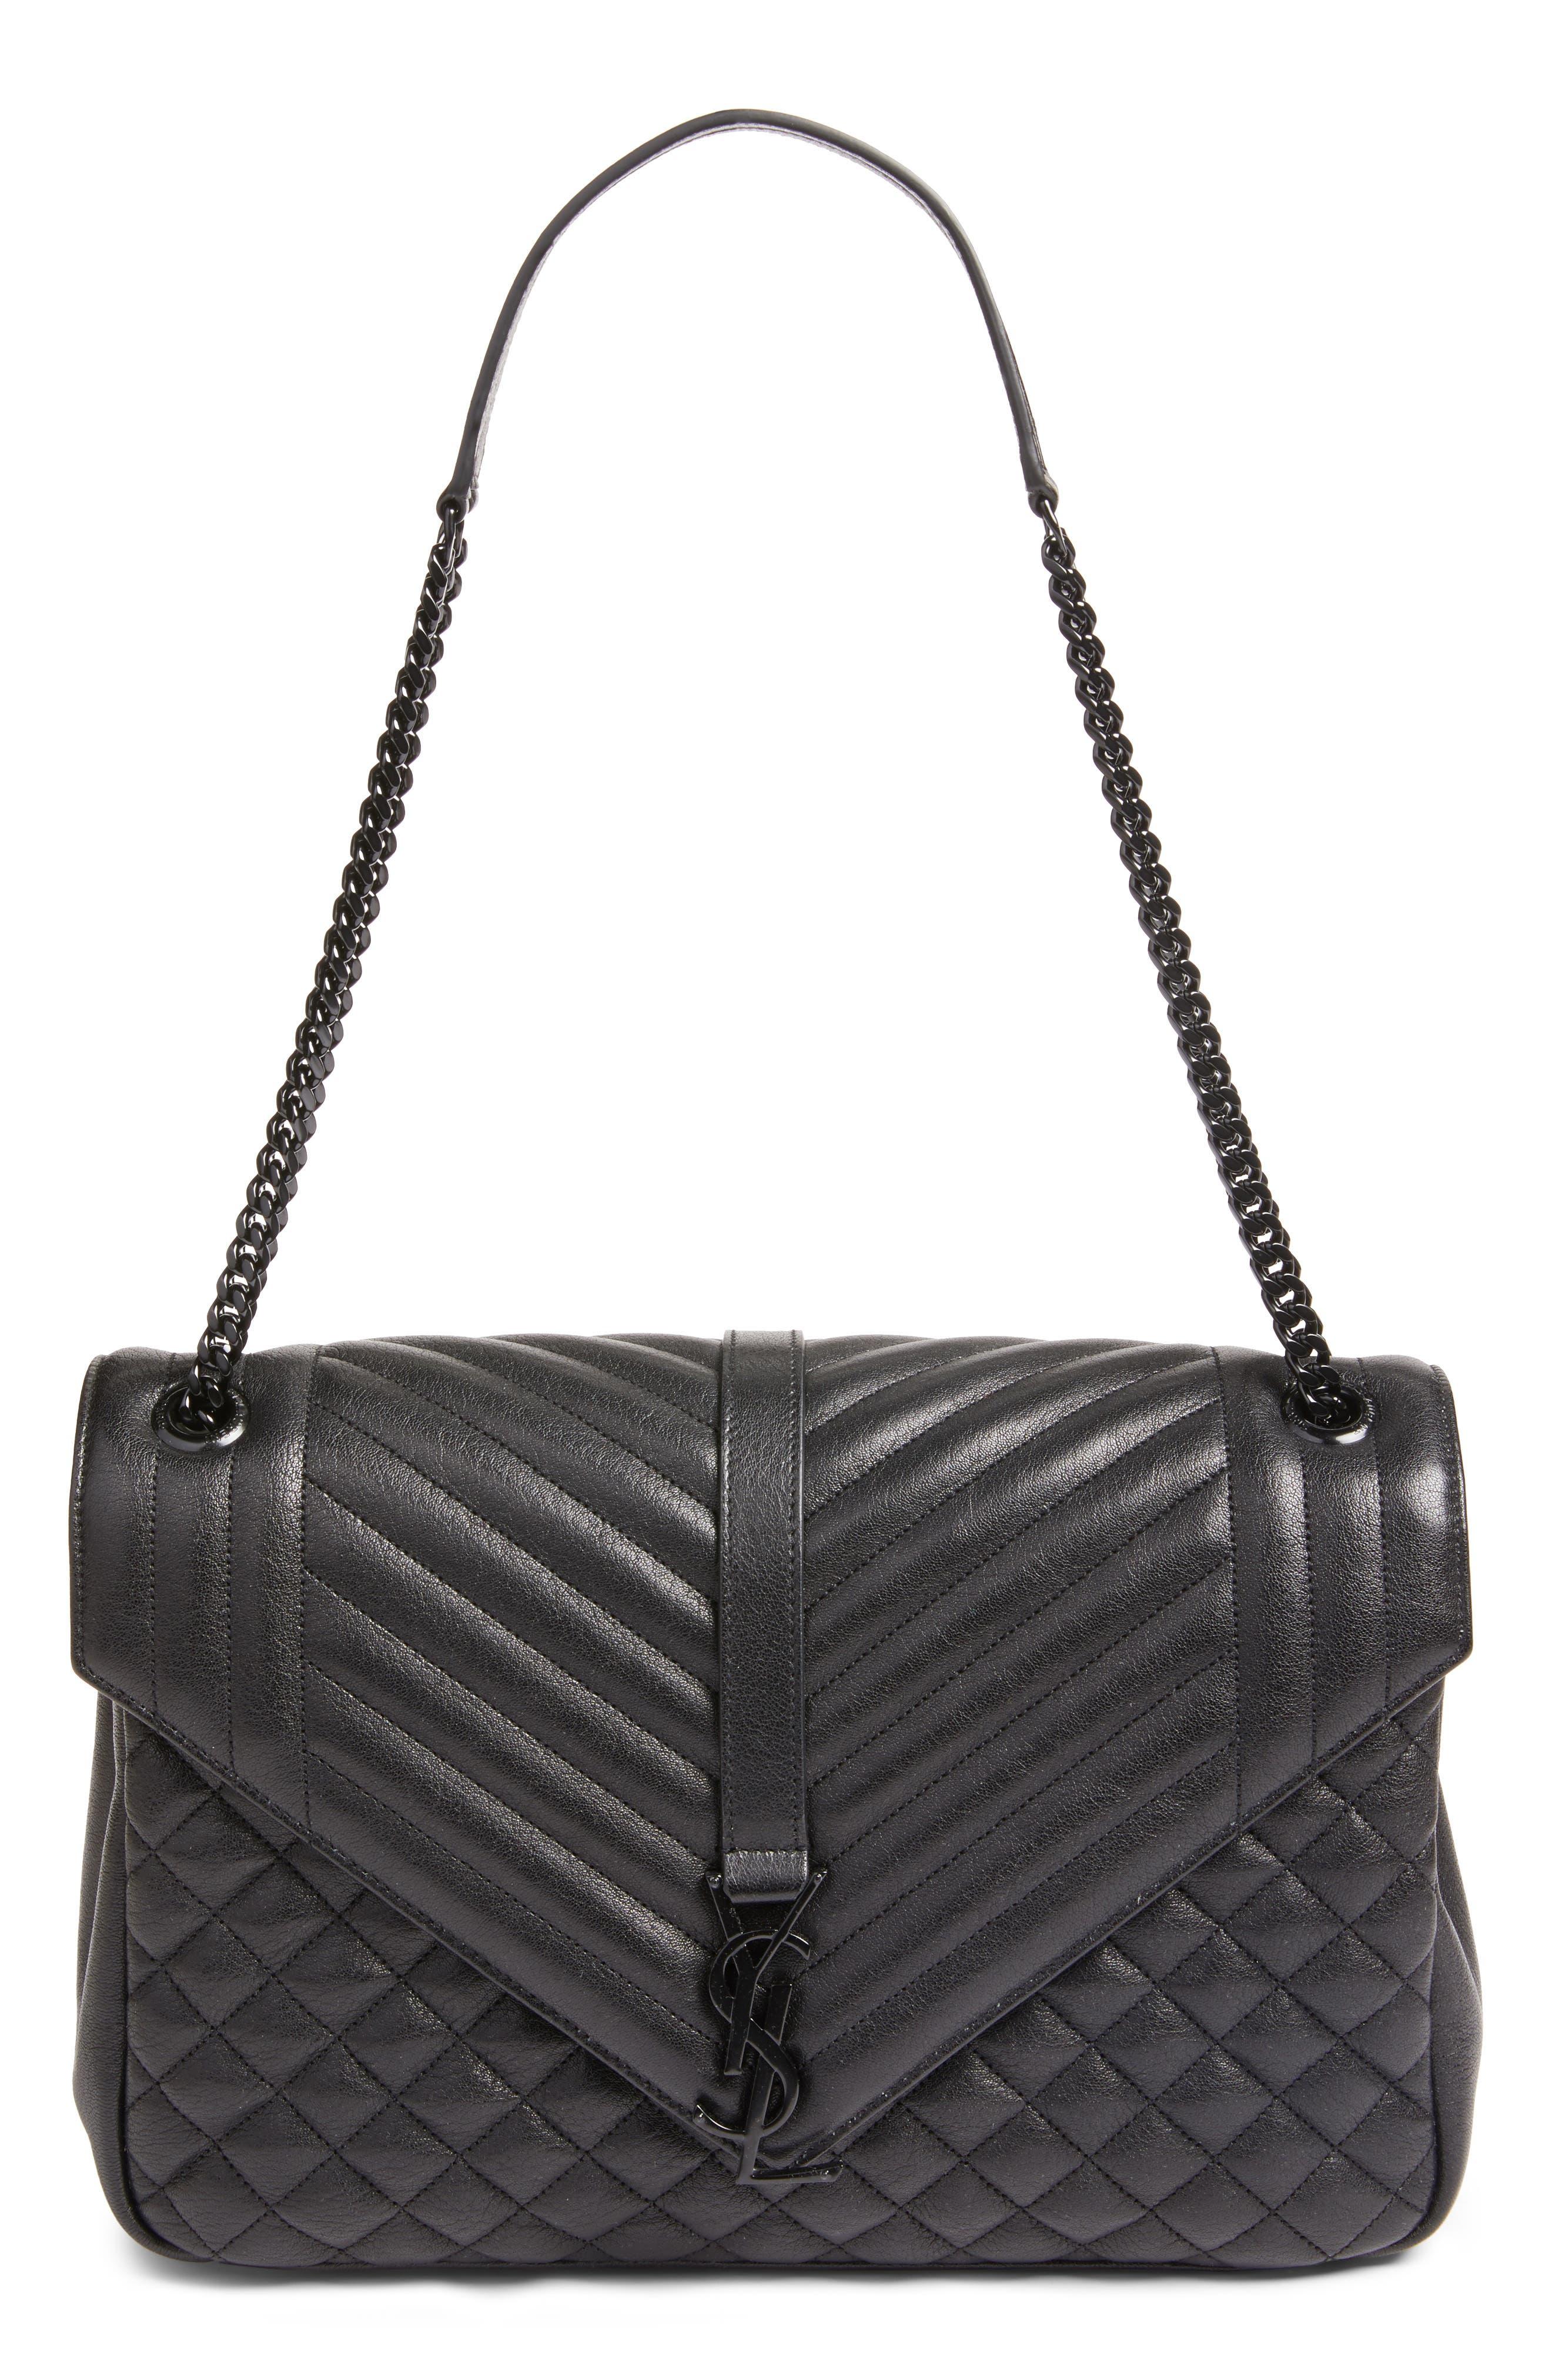 Saint Laurent Large Monogramme Matelassé Calfskin Leather Shoulder Bag